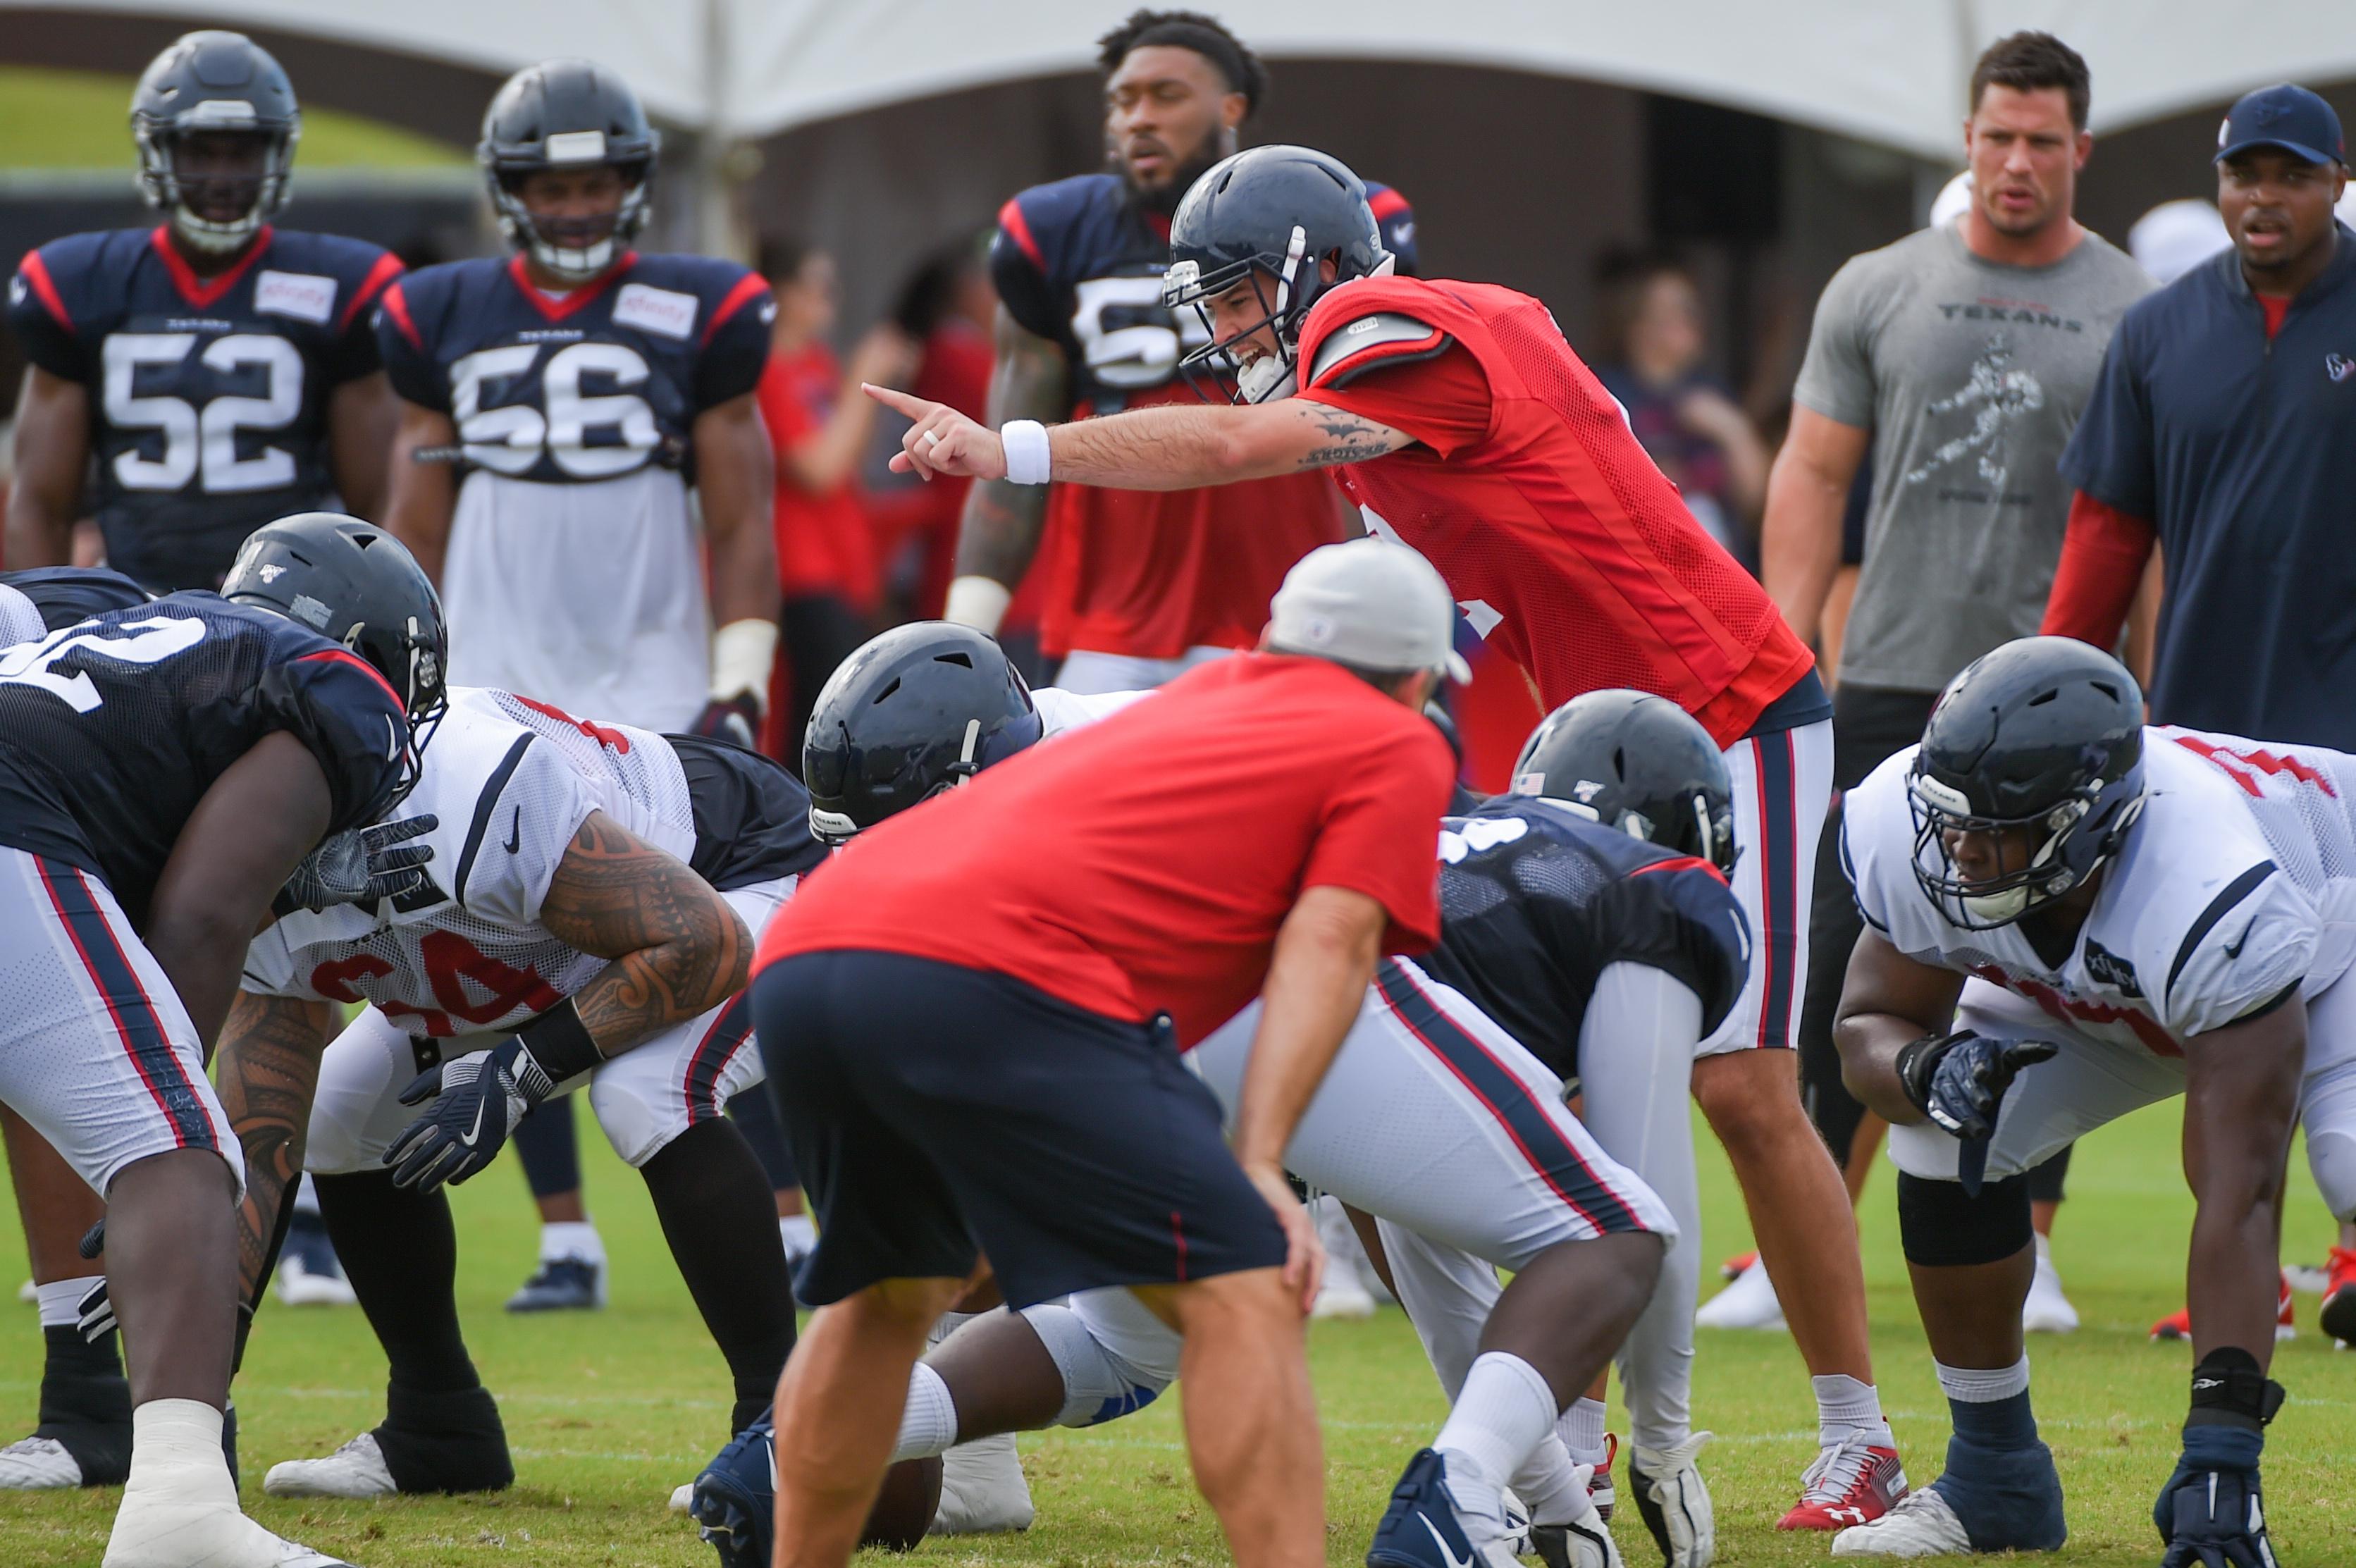 NFL: AUG 03 Texans Training Camp